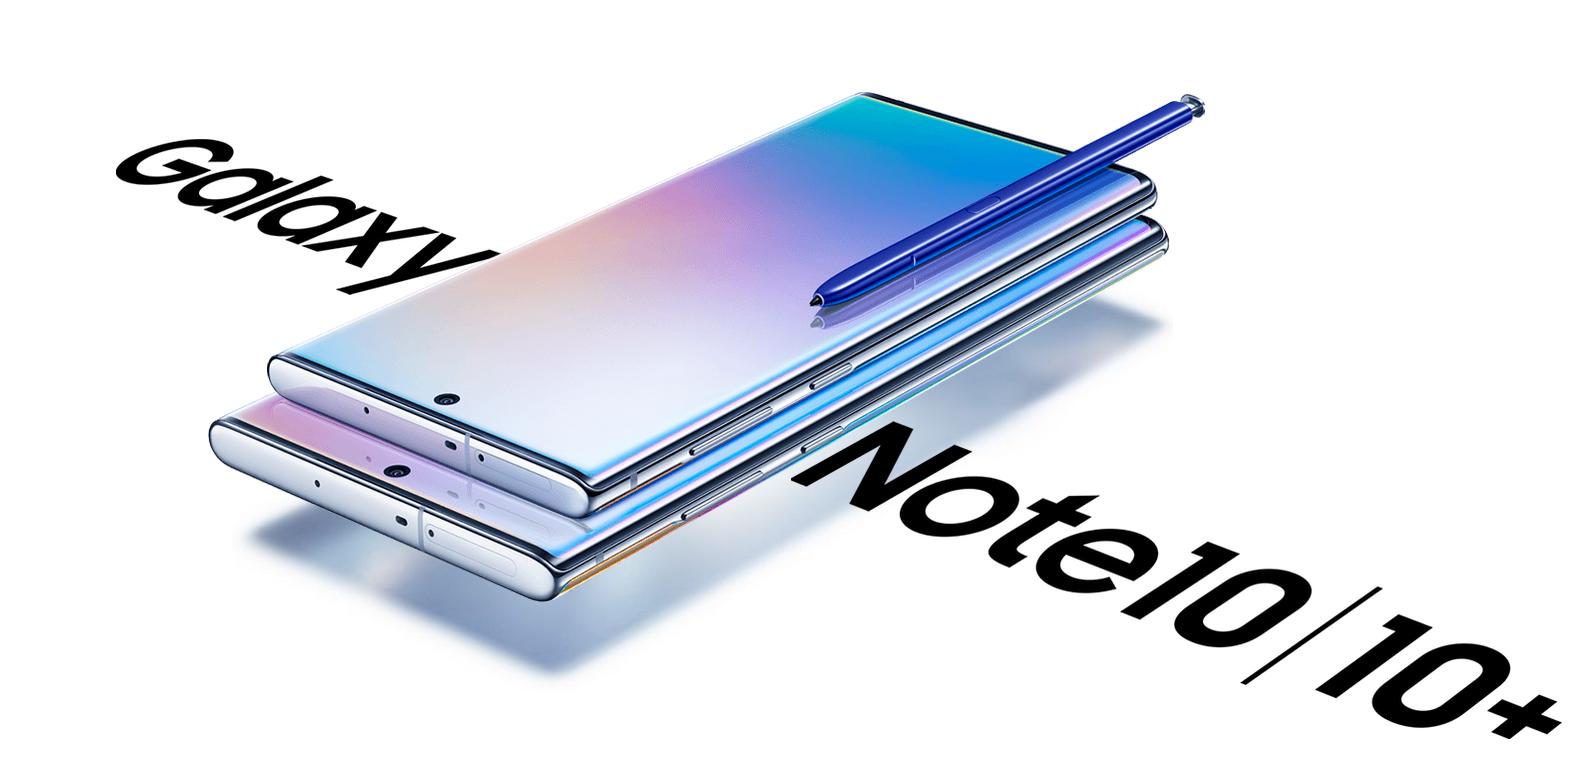 Imagen destacada: Samsung Galaxy Note 10